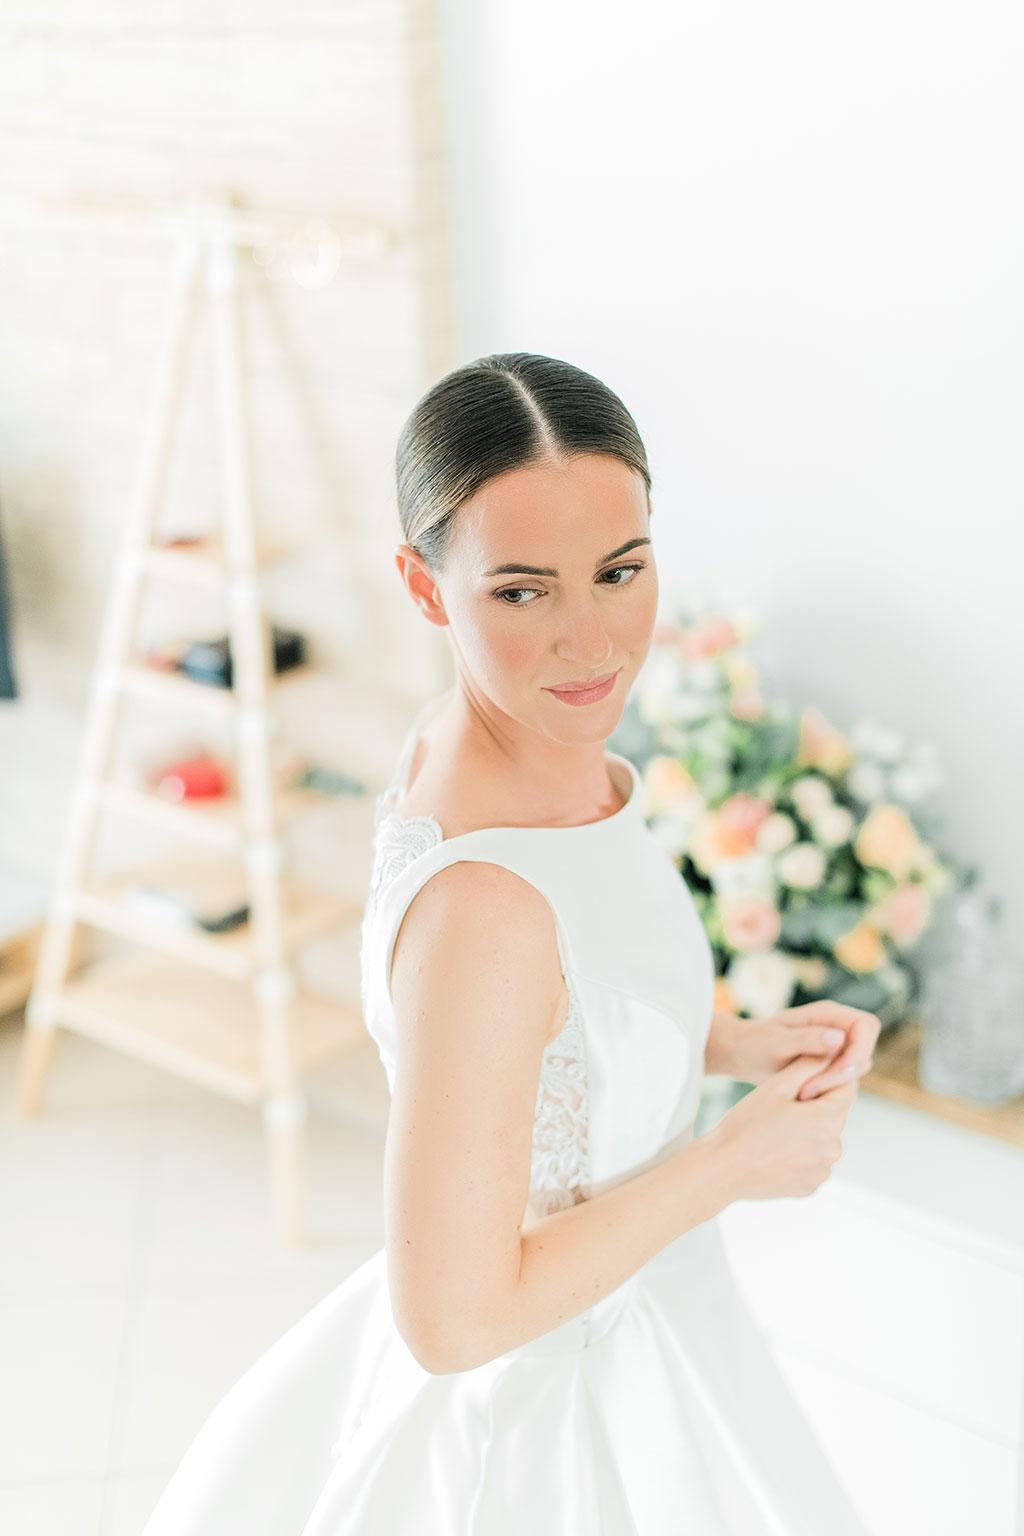 bridal preparation, Φωτογράφος γάμου Χαλκιδική